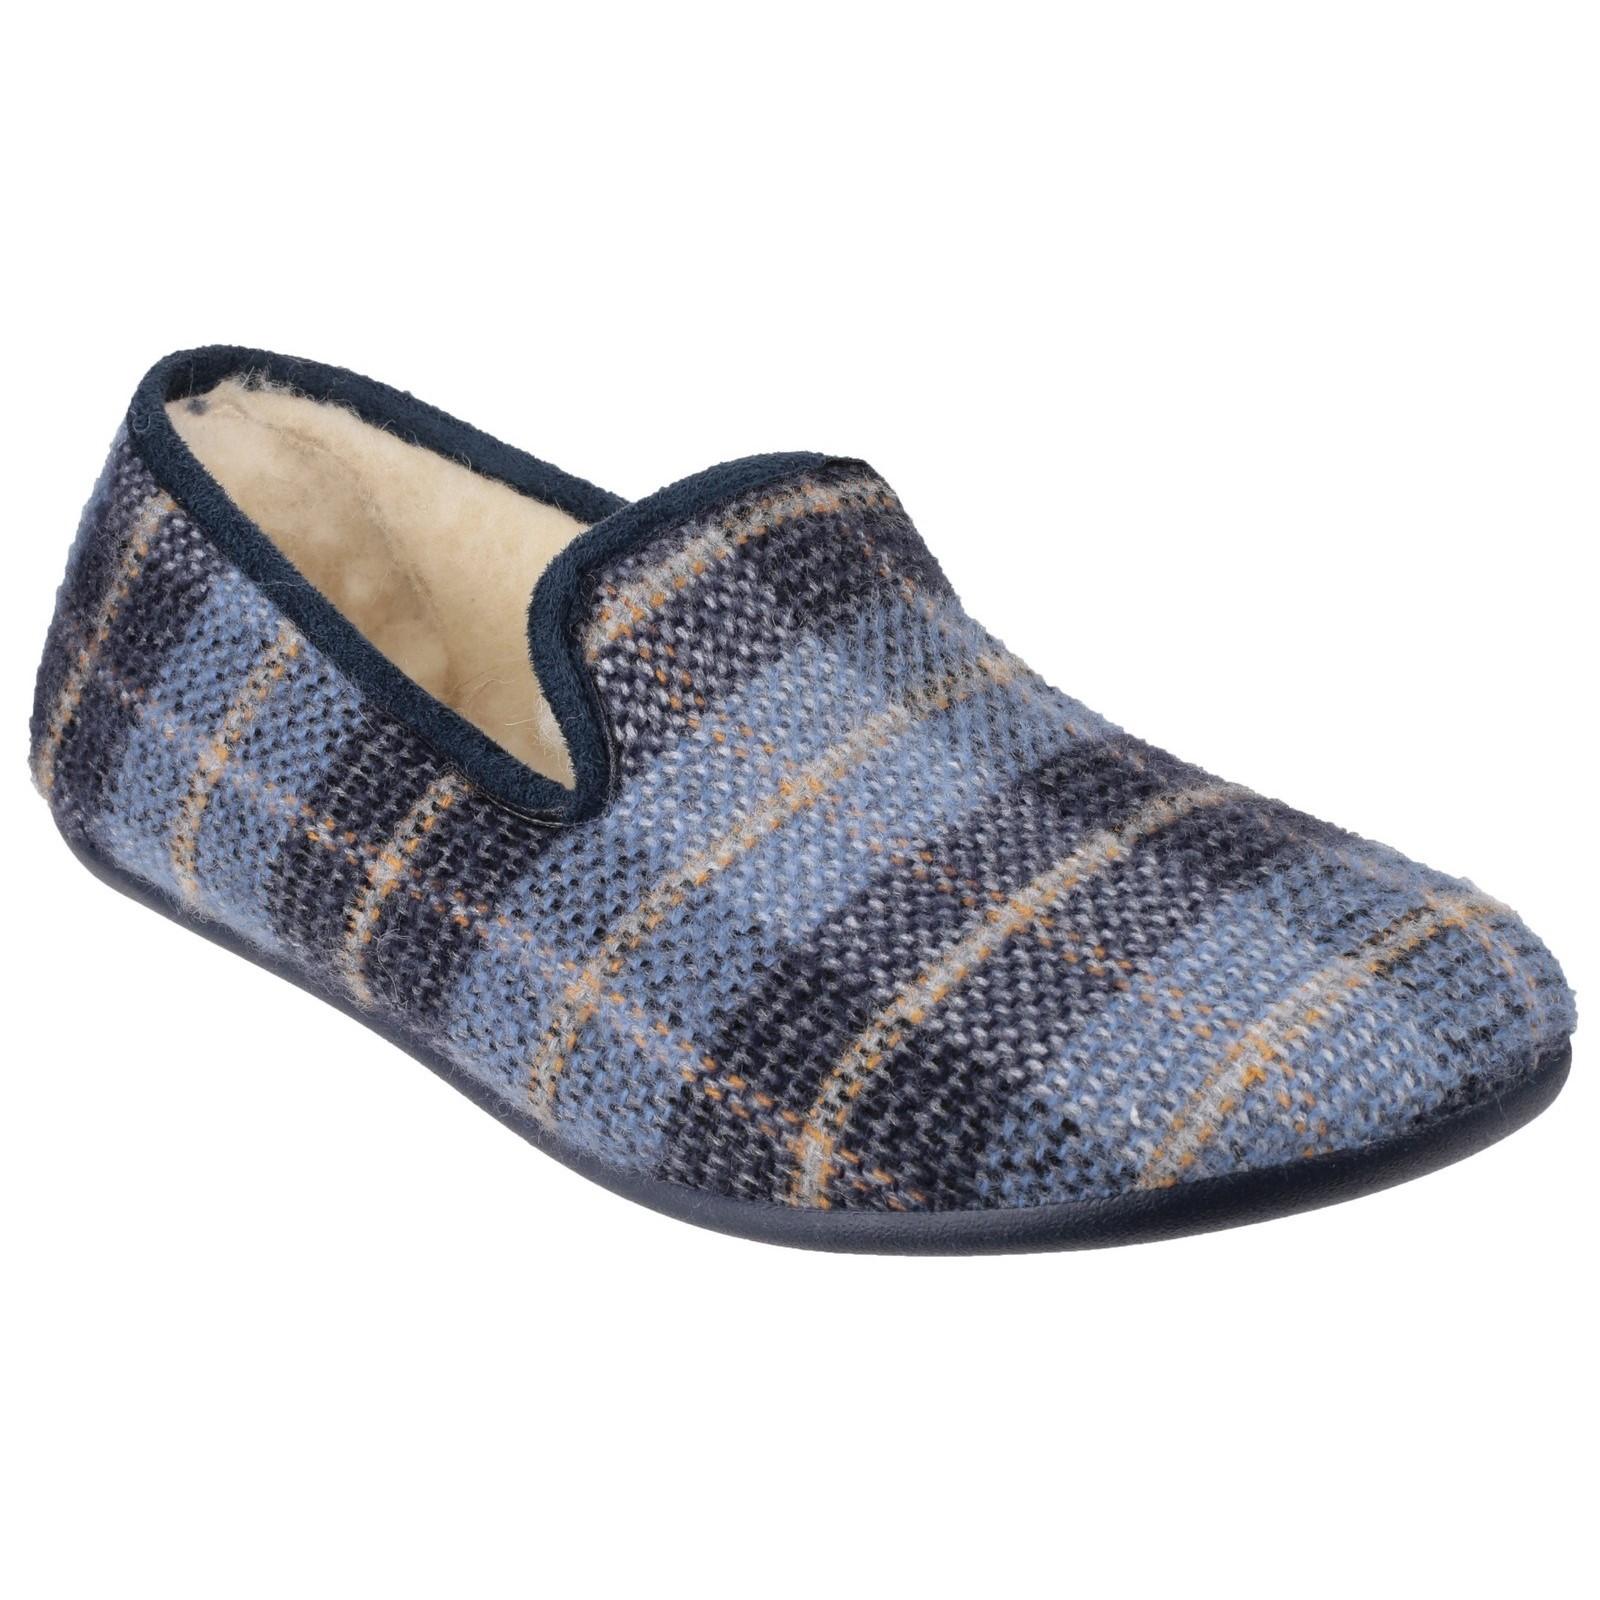 cotswold wallis herren schuhe slipper hausschuhe. Black Bedroom Furniture Sets. Home Design Ideas